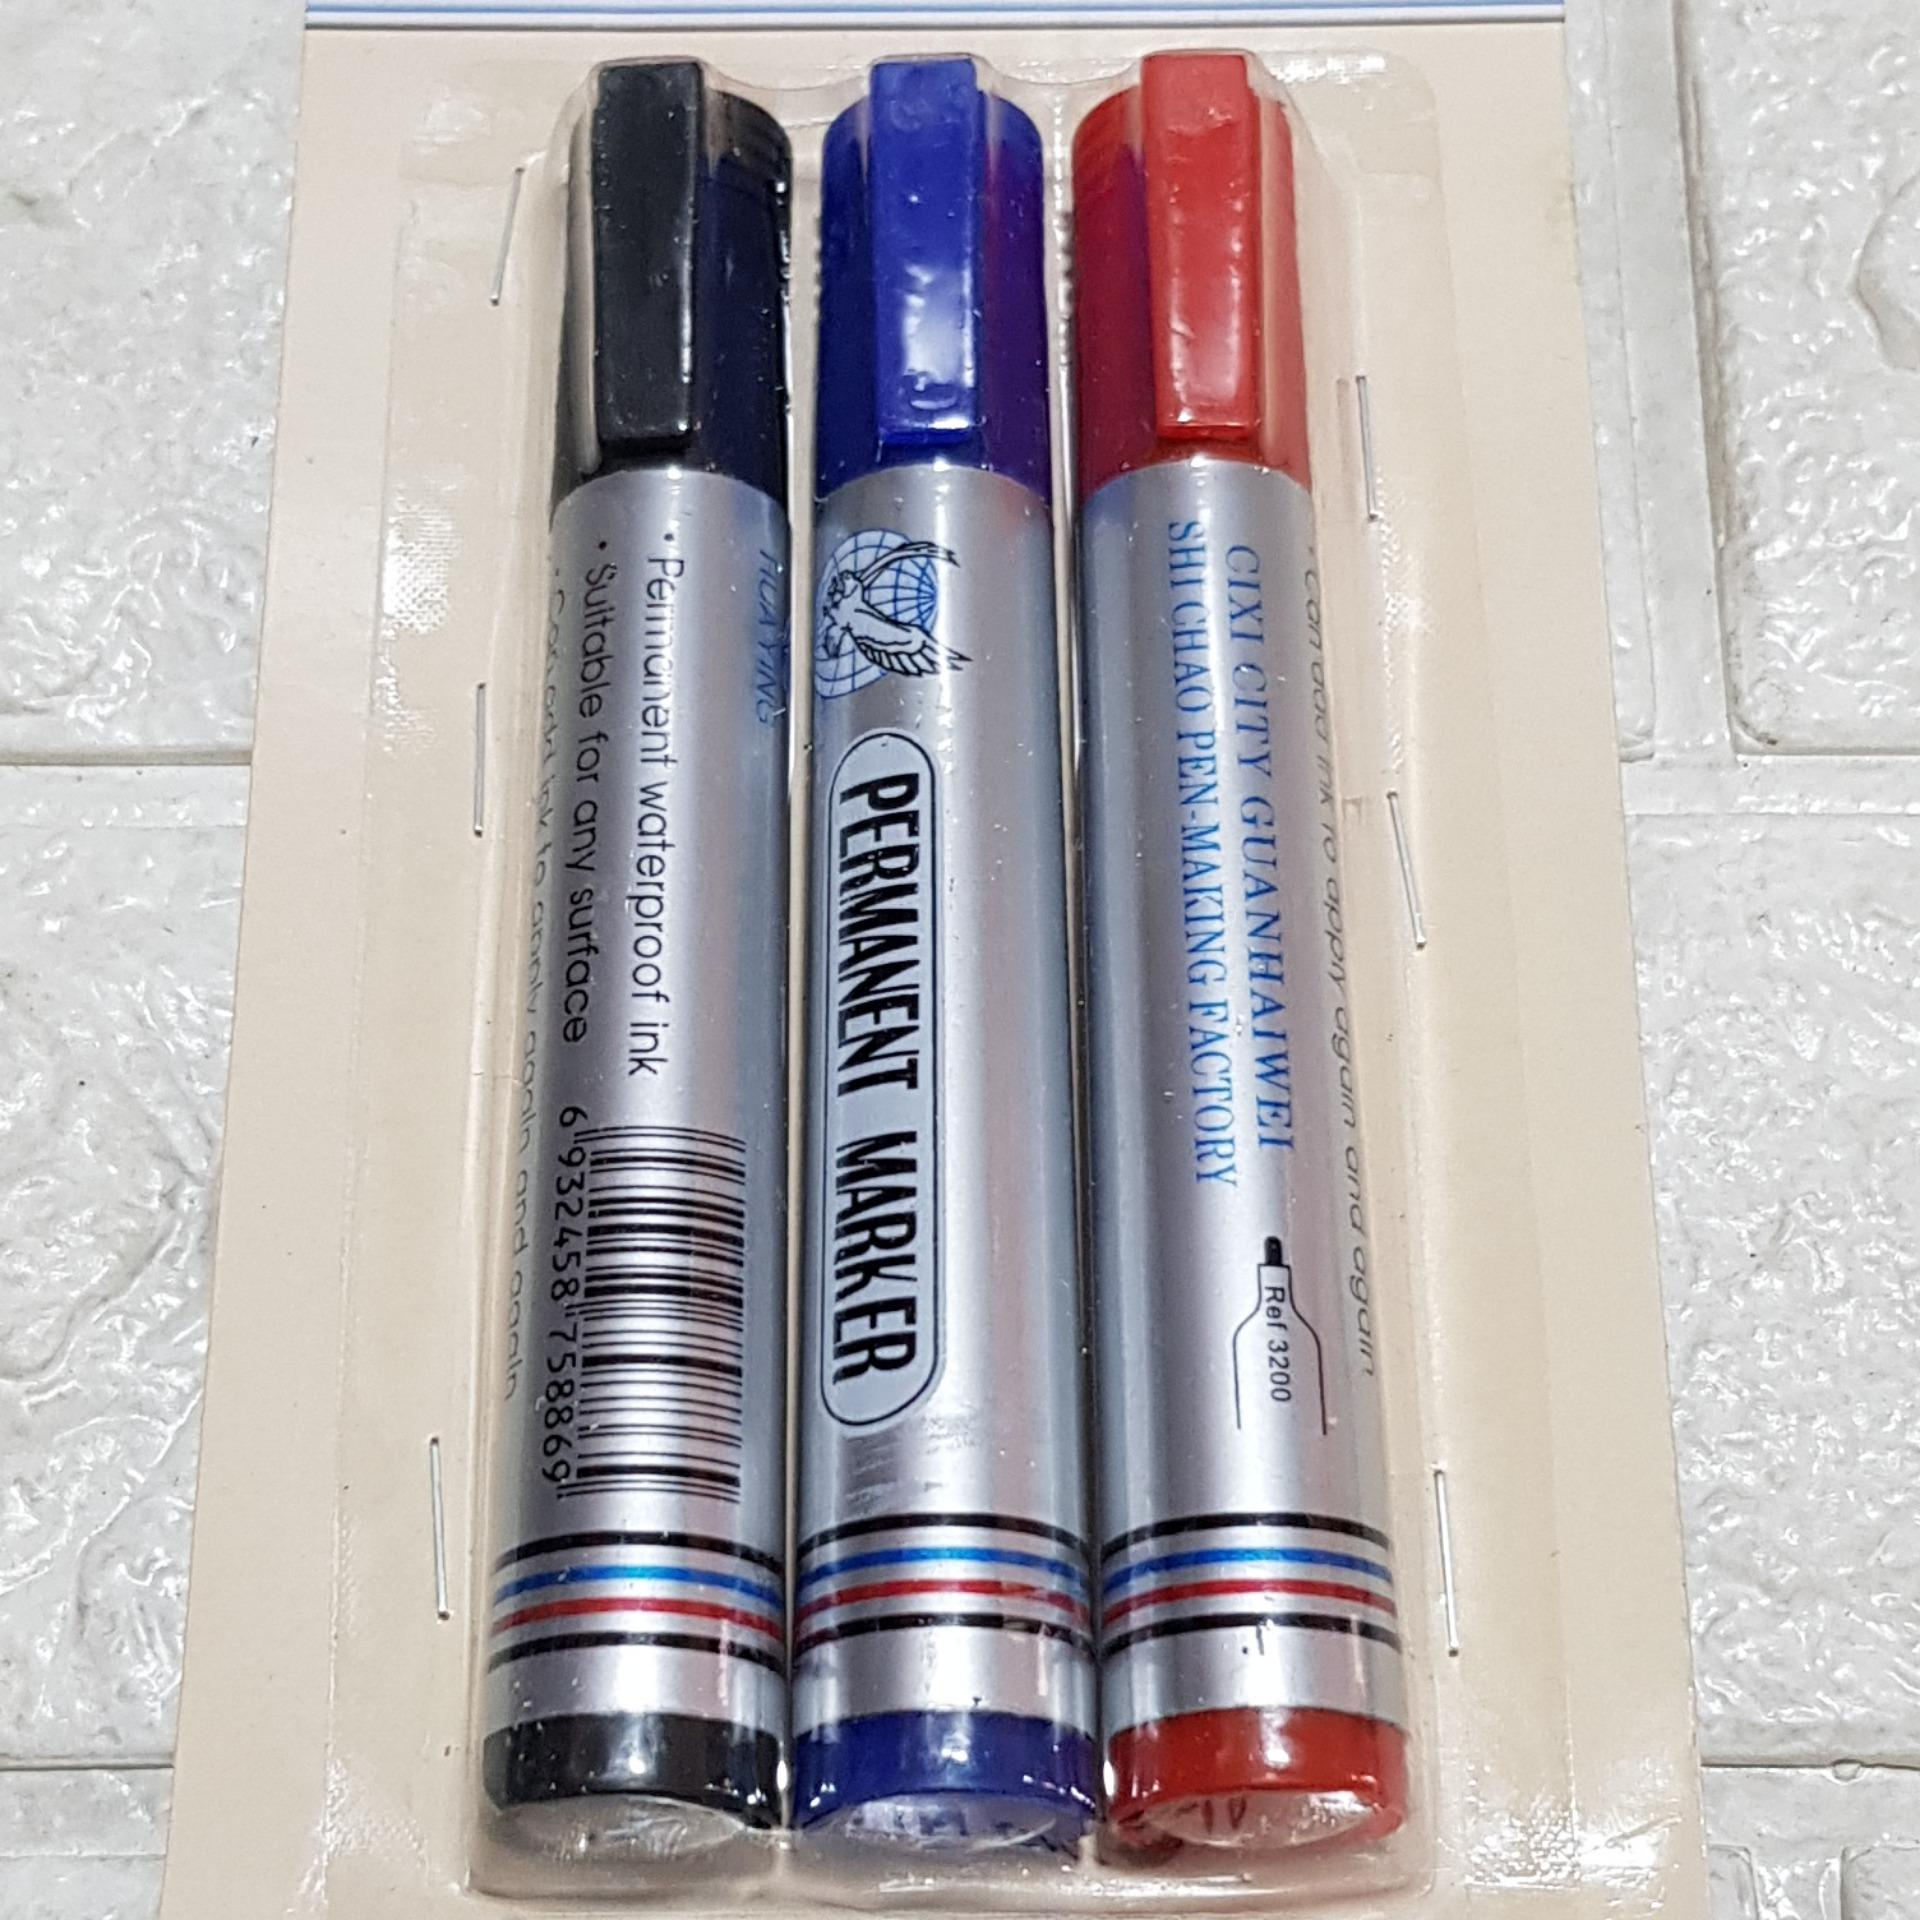 Brief for KIDS size 6 for 4-5 yrs old random design set of 6's